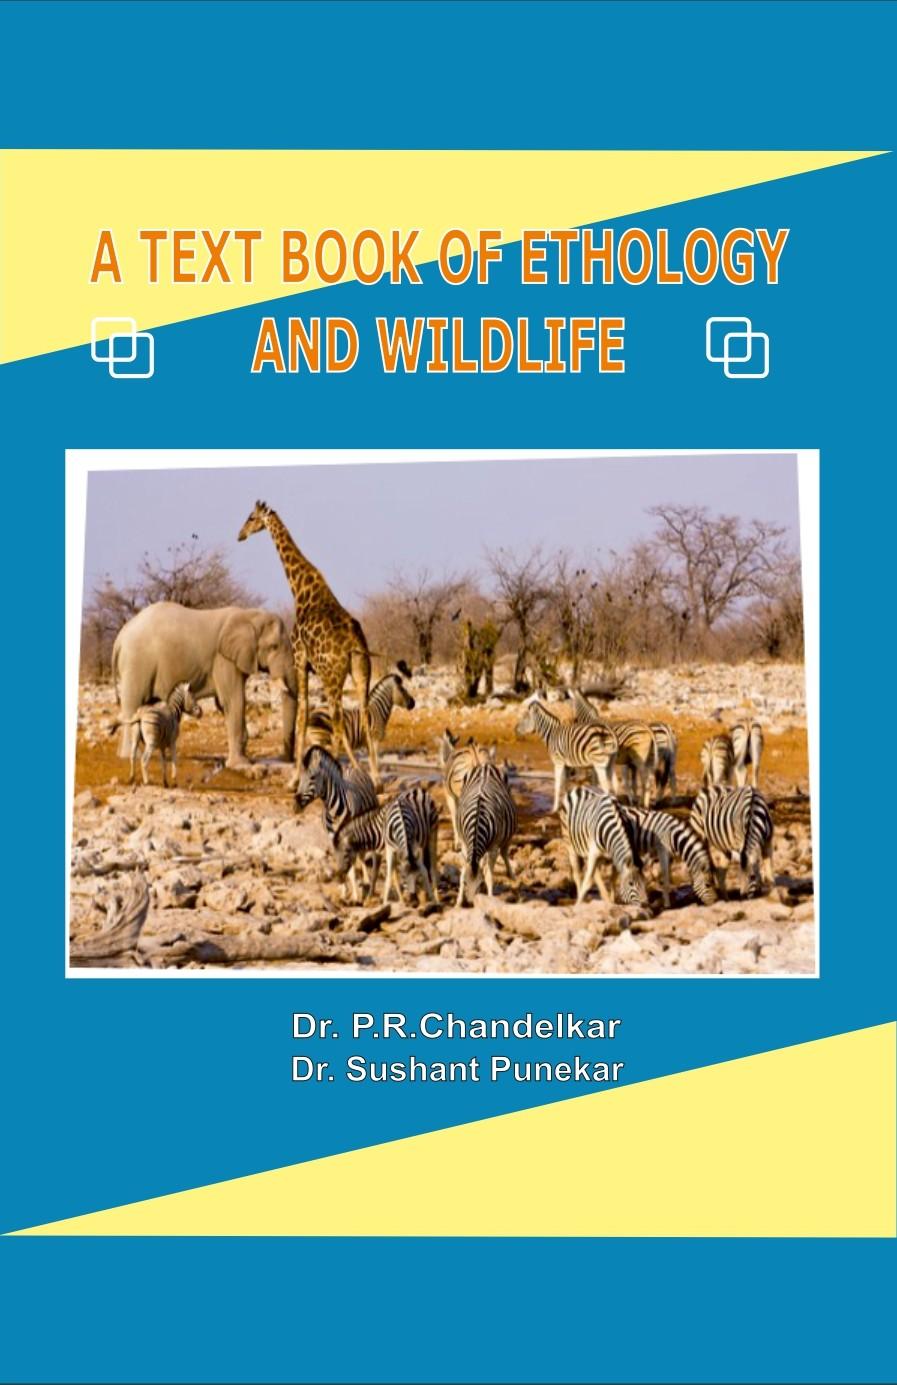 A Text Book of Ethology and Wildlife (Hardback)